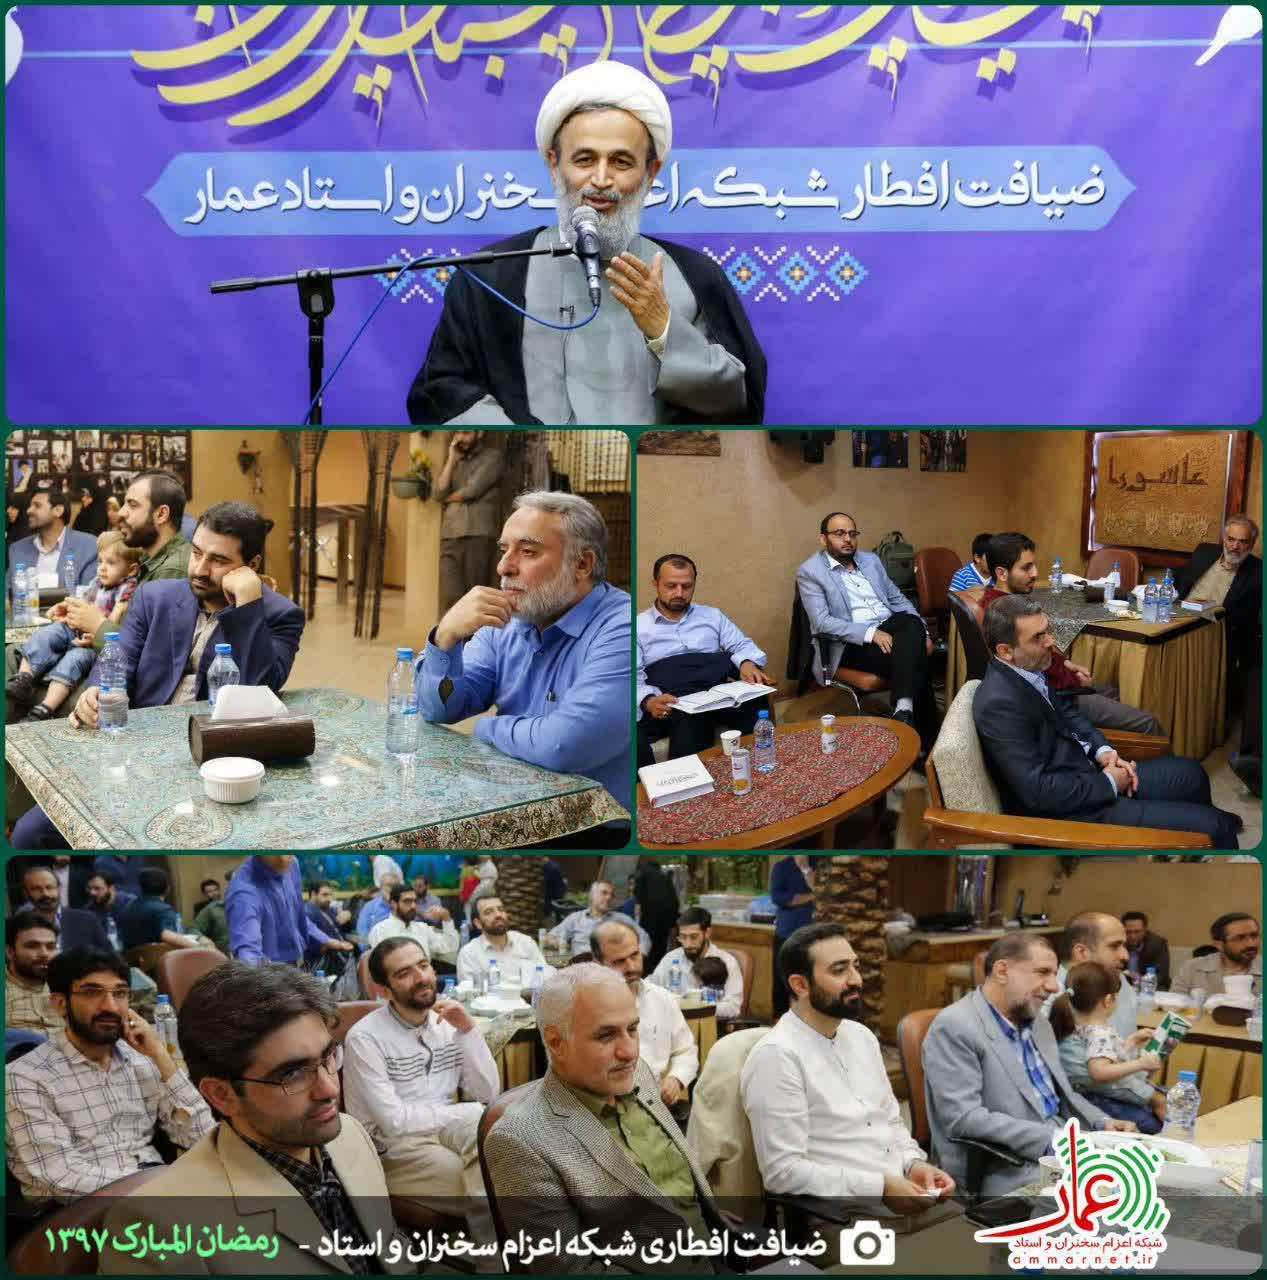 http://dl-abbasi.ir/yekta/1397/Image/Tehran/Ammarnet/IMG_970323-2.jpg